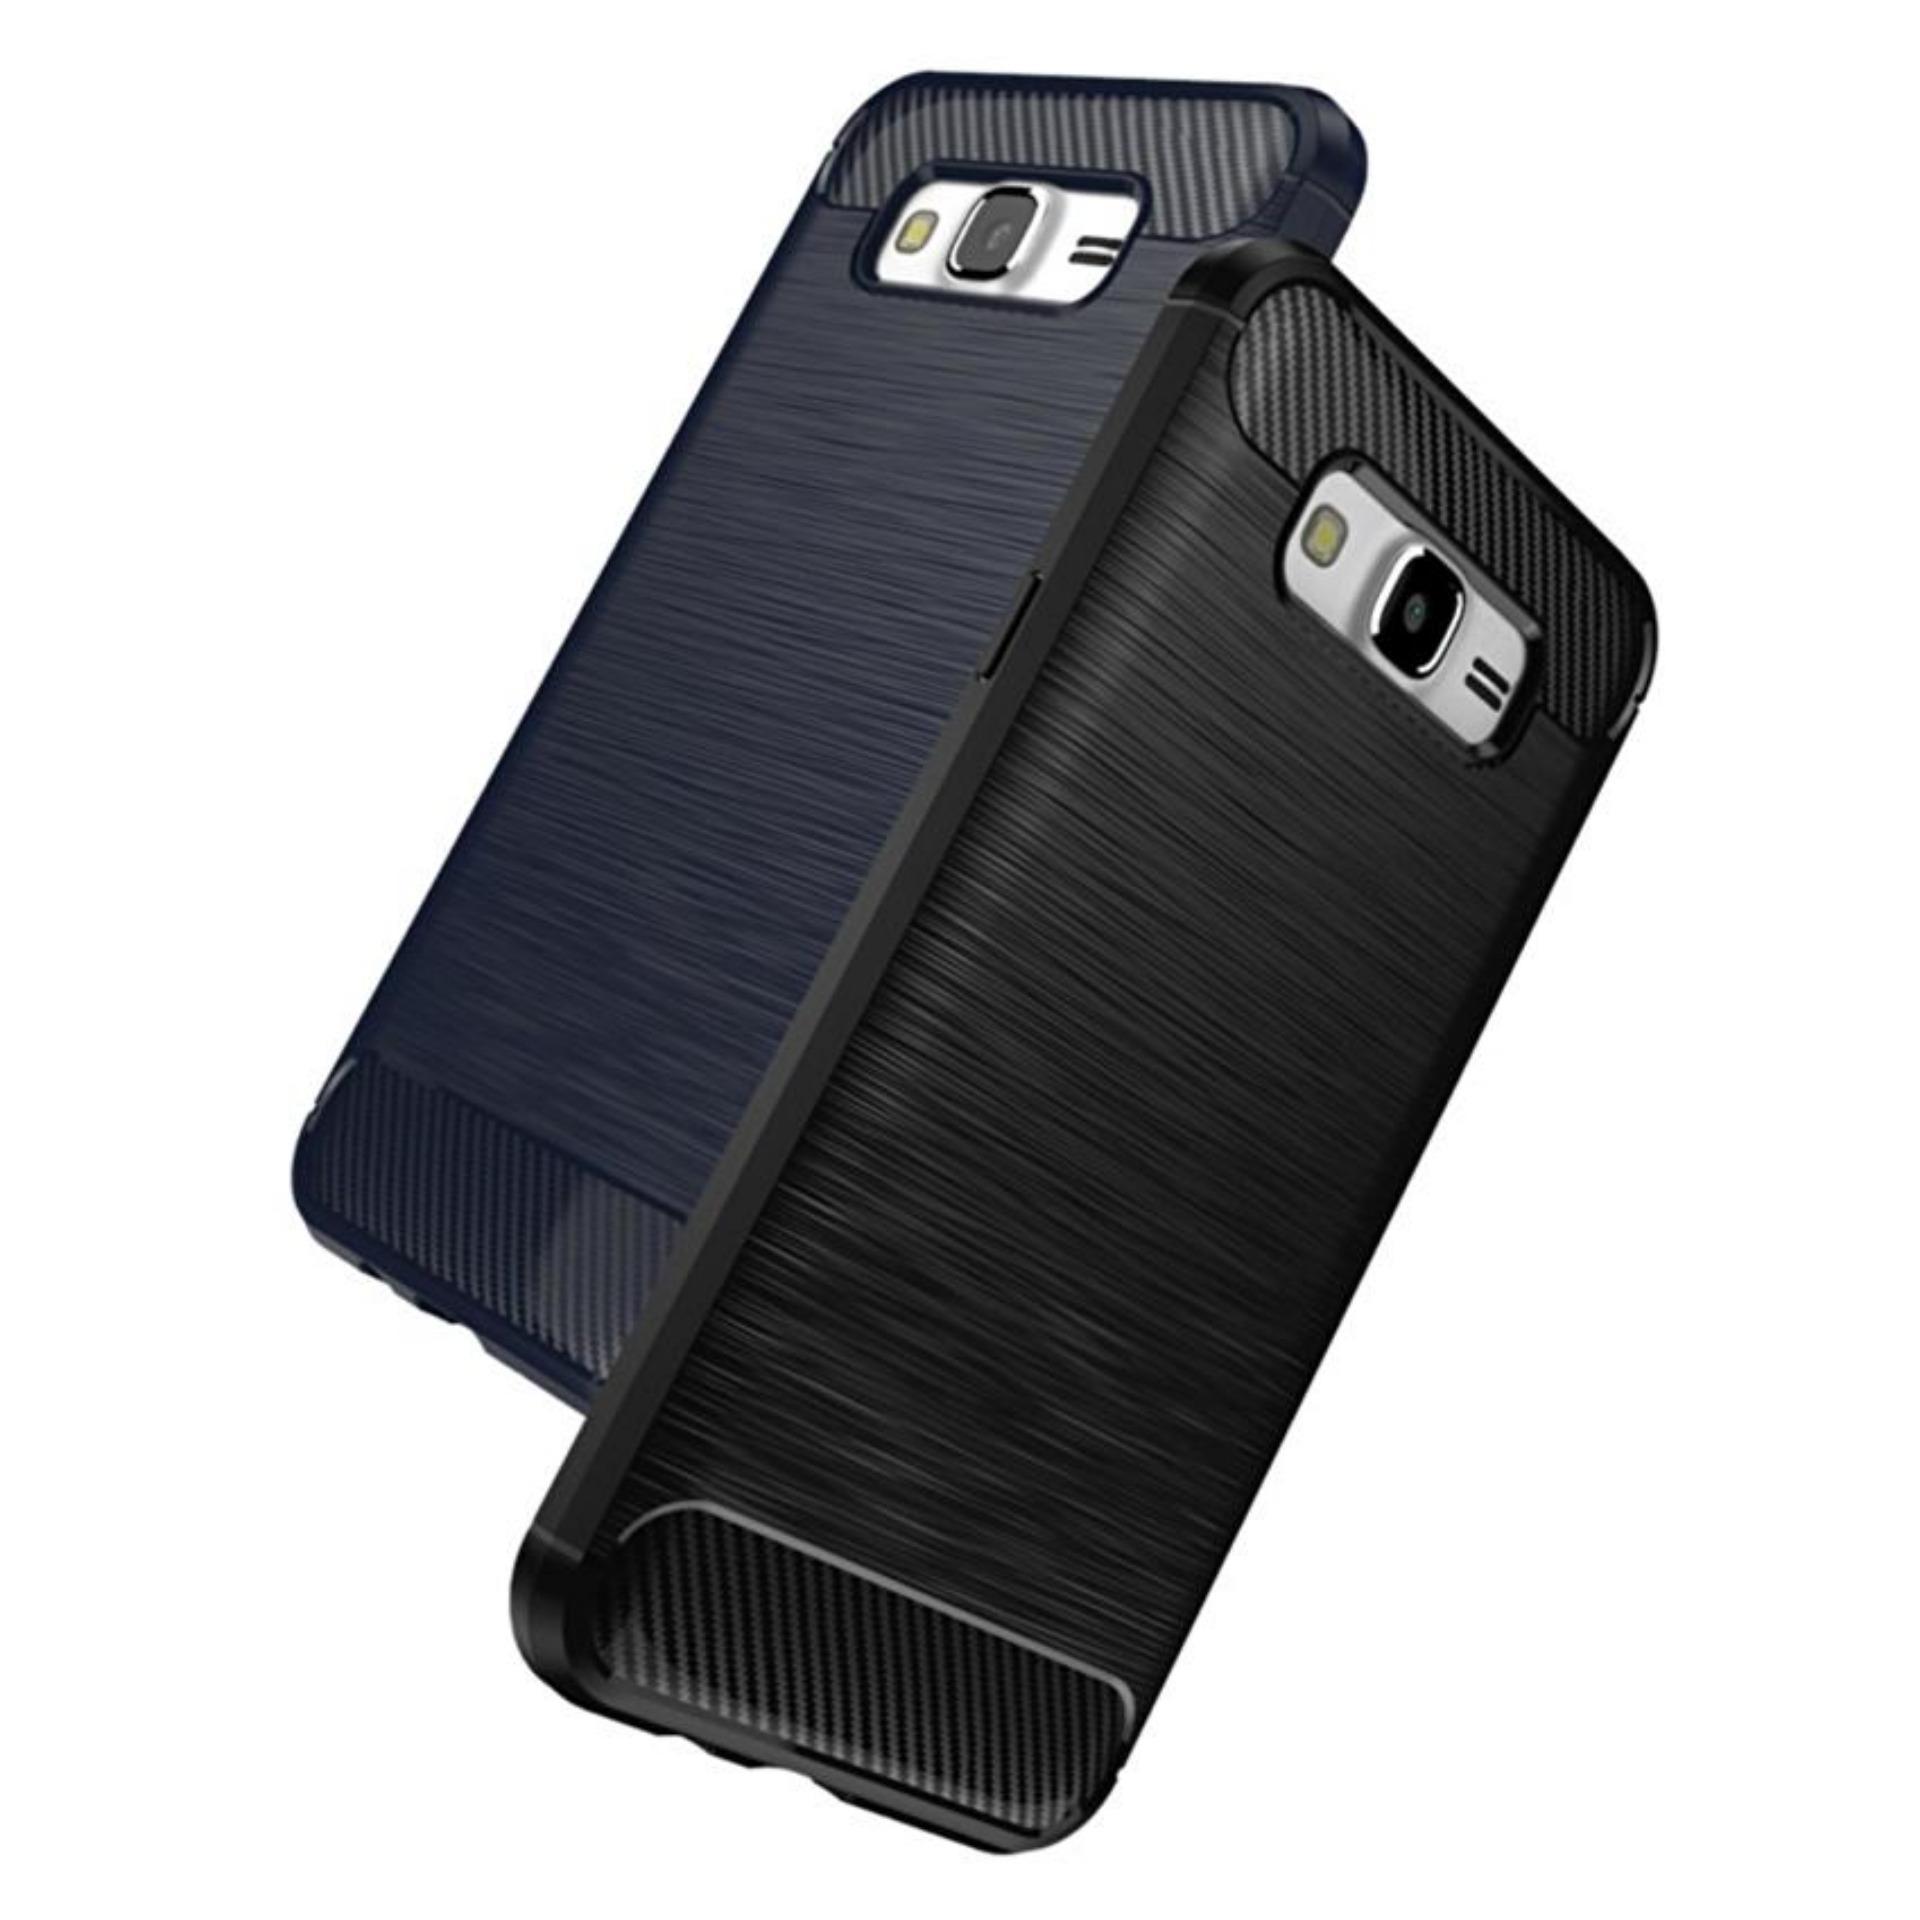 Case Ipaky Soft Carbon Shockproof For Samsung Galaxy J7 Prime On7 Peonia Transparent Acrylic Hybrid Tg Fiber J2prime Black